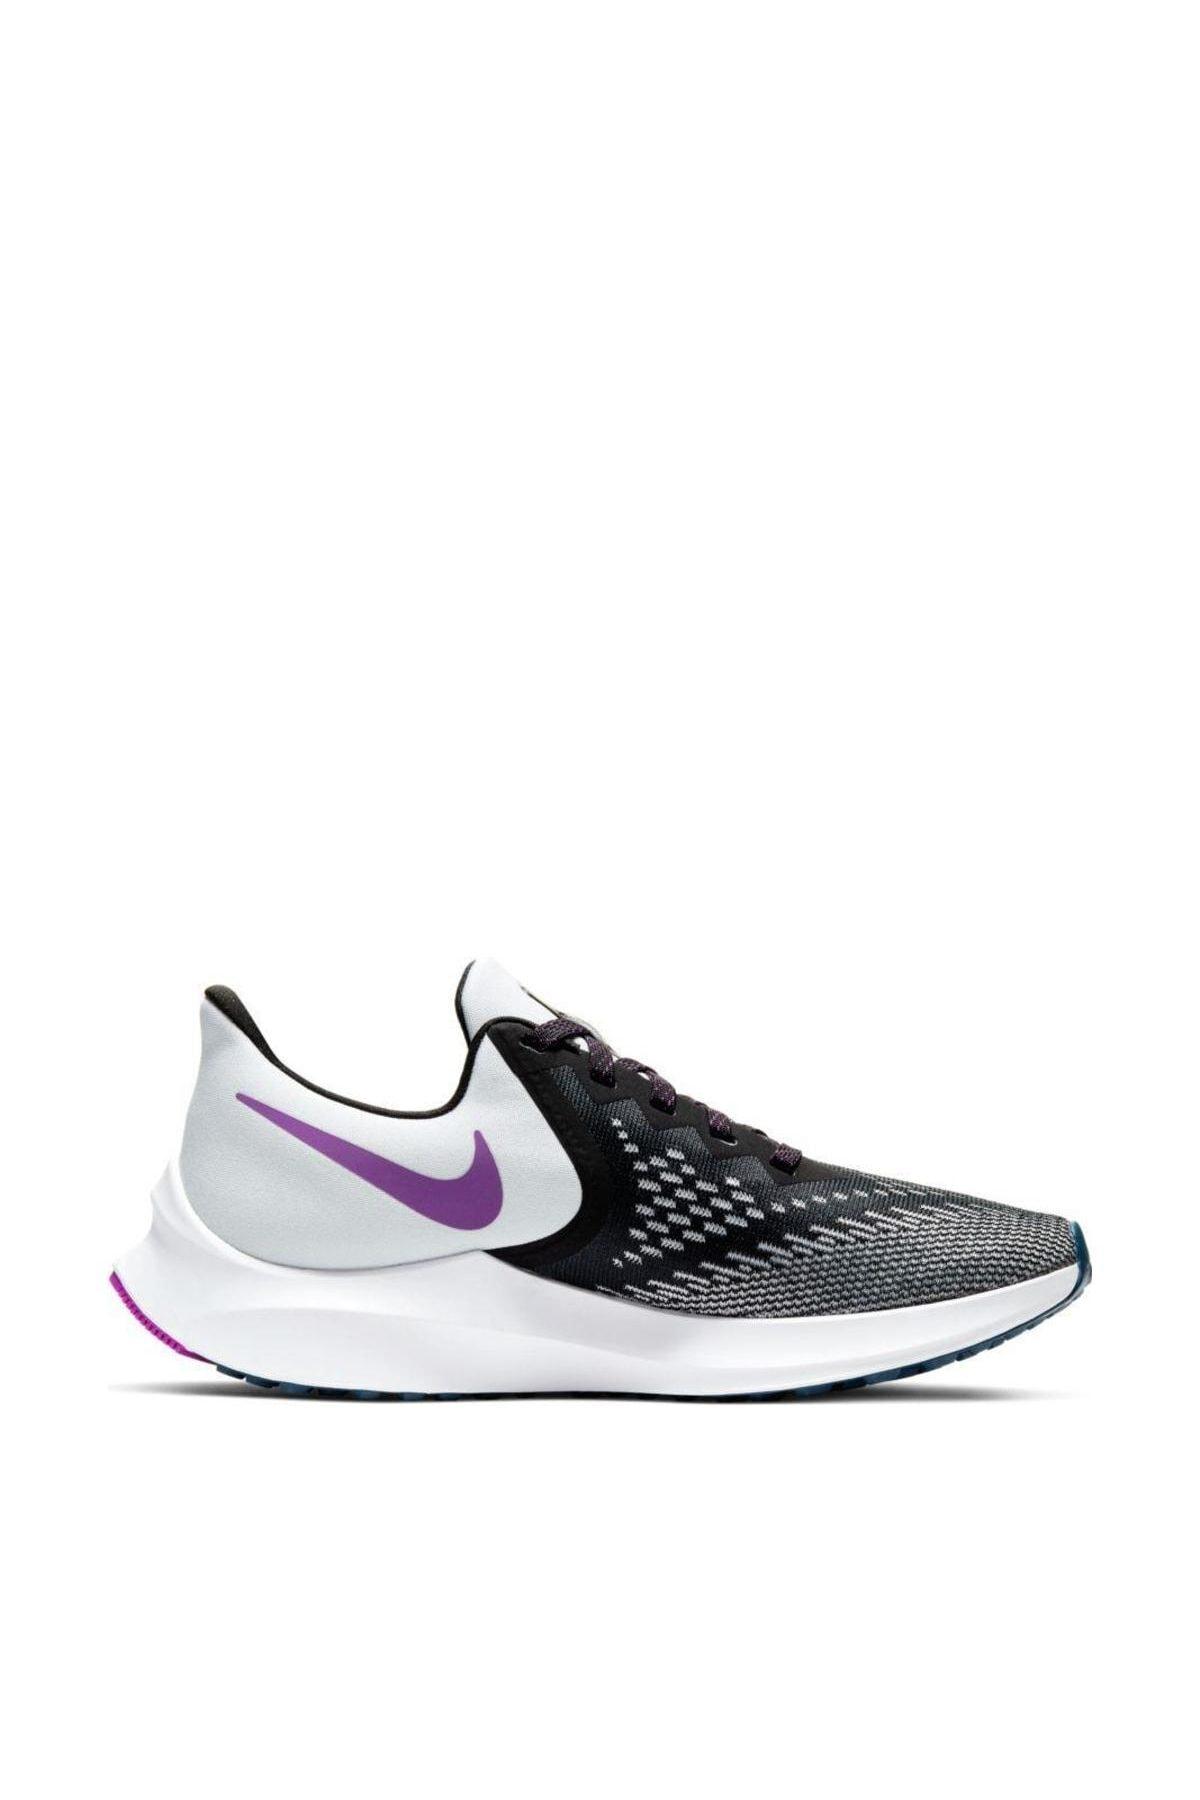 Nike Air Zoom Winflo 6 Kadın Ayakkabı AQ8228-006 1